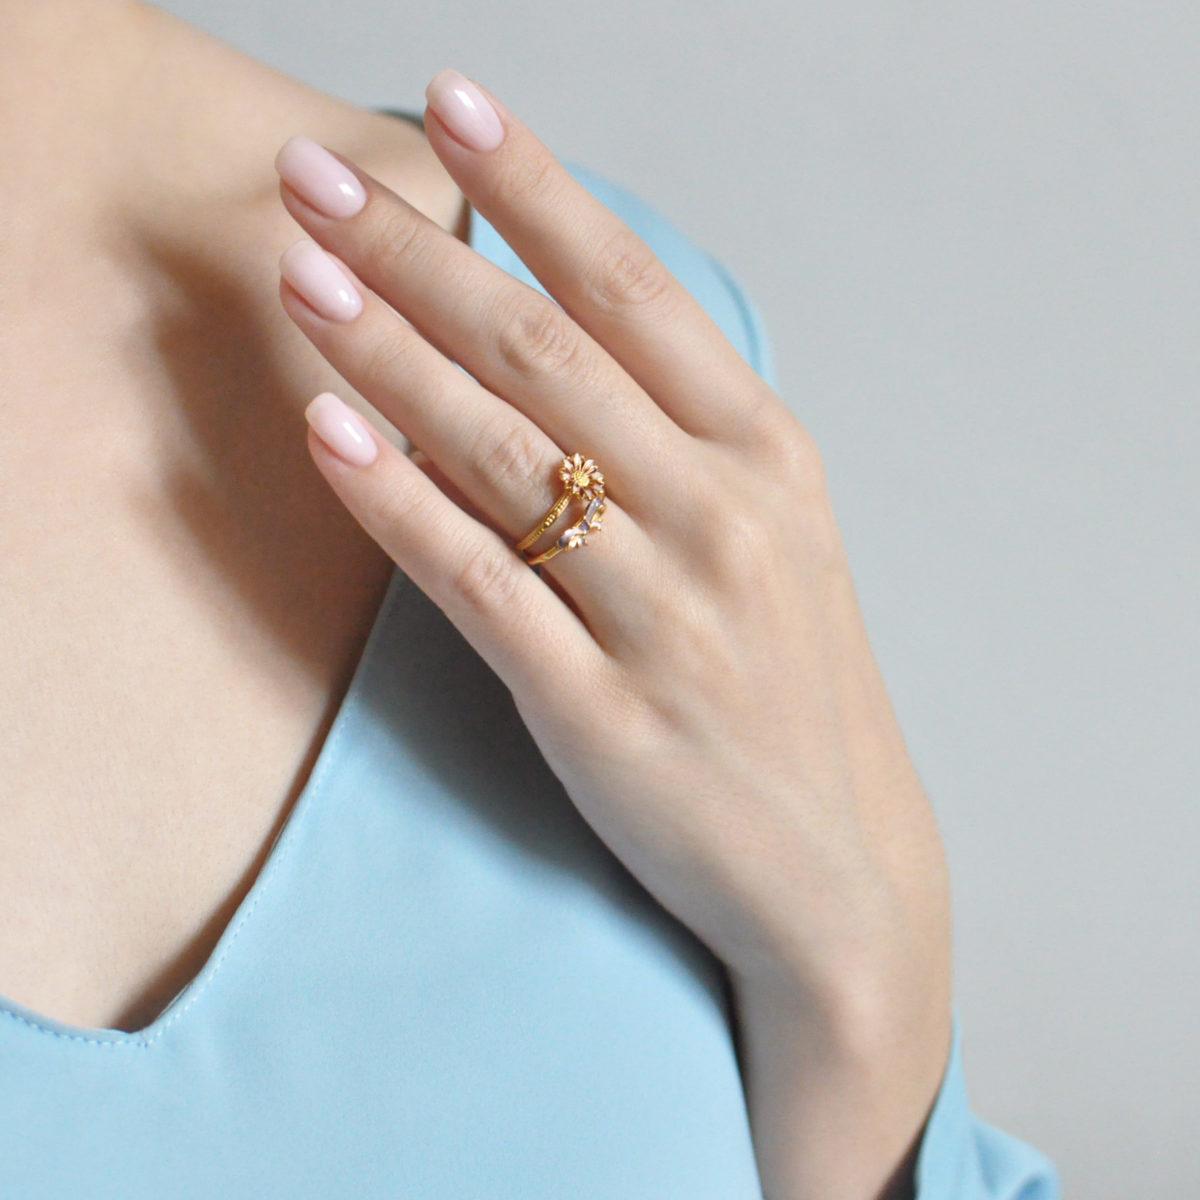 61.206 z rozovaya 61.201z rozovaya 1200x1200 - Кольцо из серебра «Ромашка» (золочение), розовое